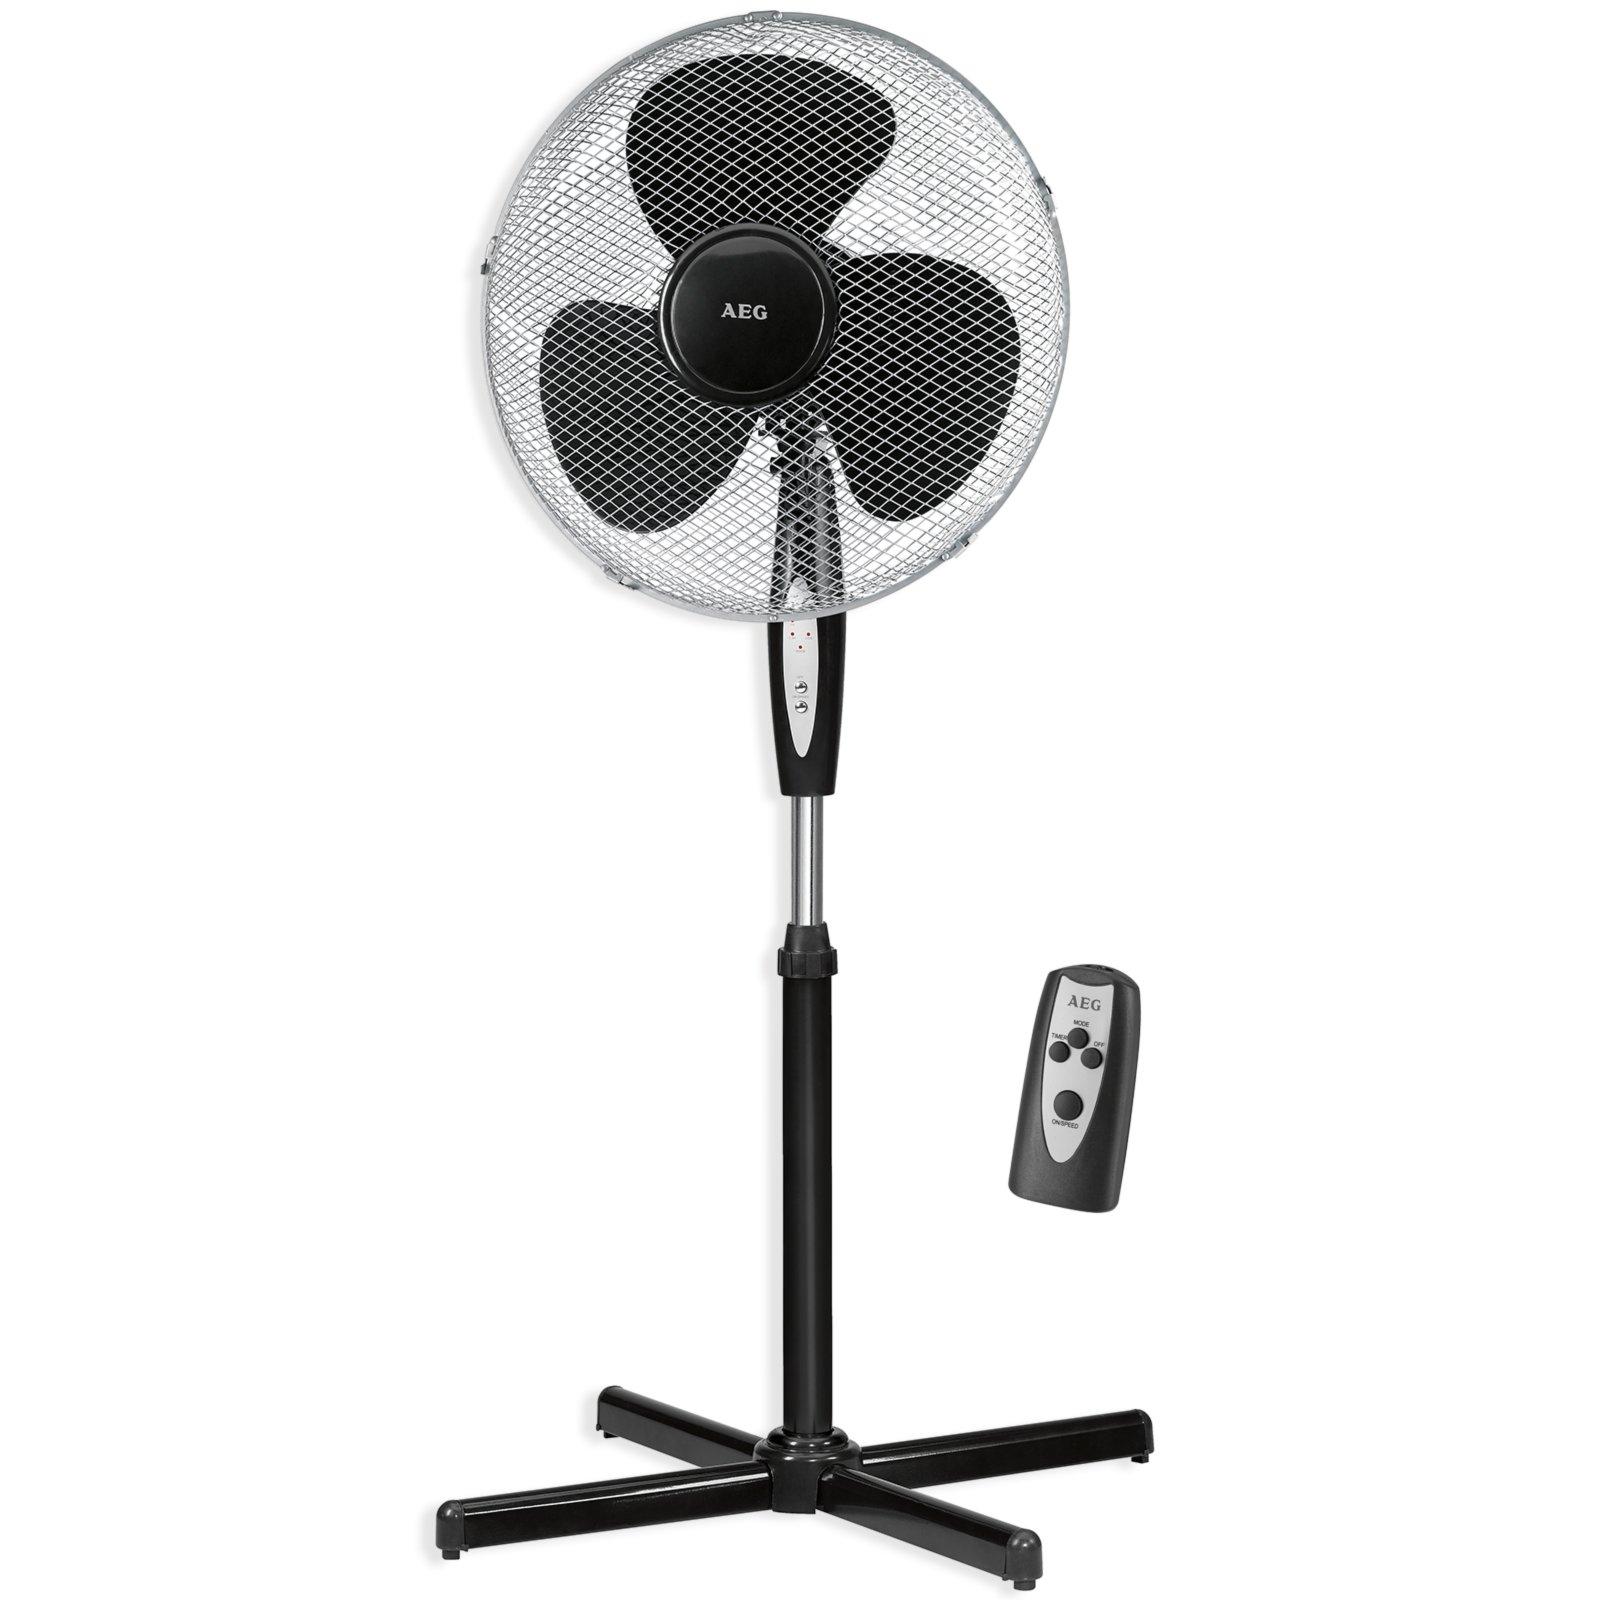 aeg stand ventilator 520695 schwarz mit fernbedienung sonstige elektrokleinger te deko. Black Bedroom Furniture Sets. Home Design Ideas